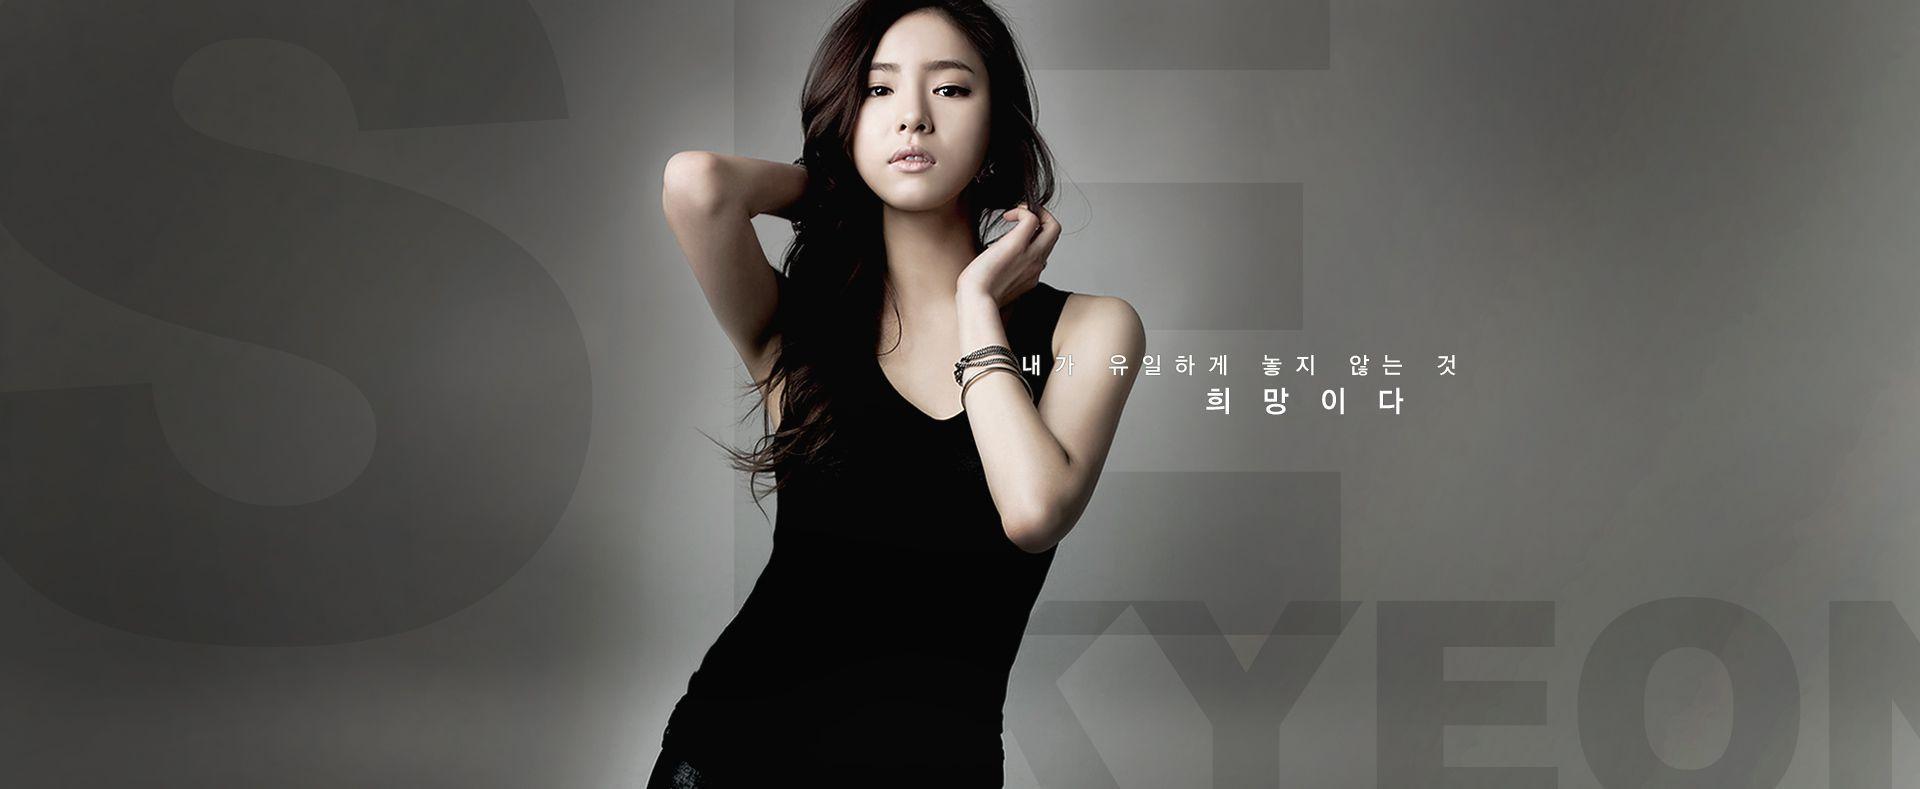 Shin se kyung five senses of eros